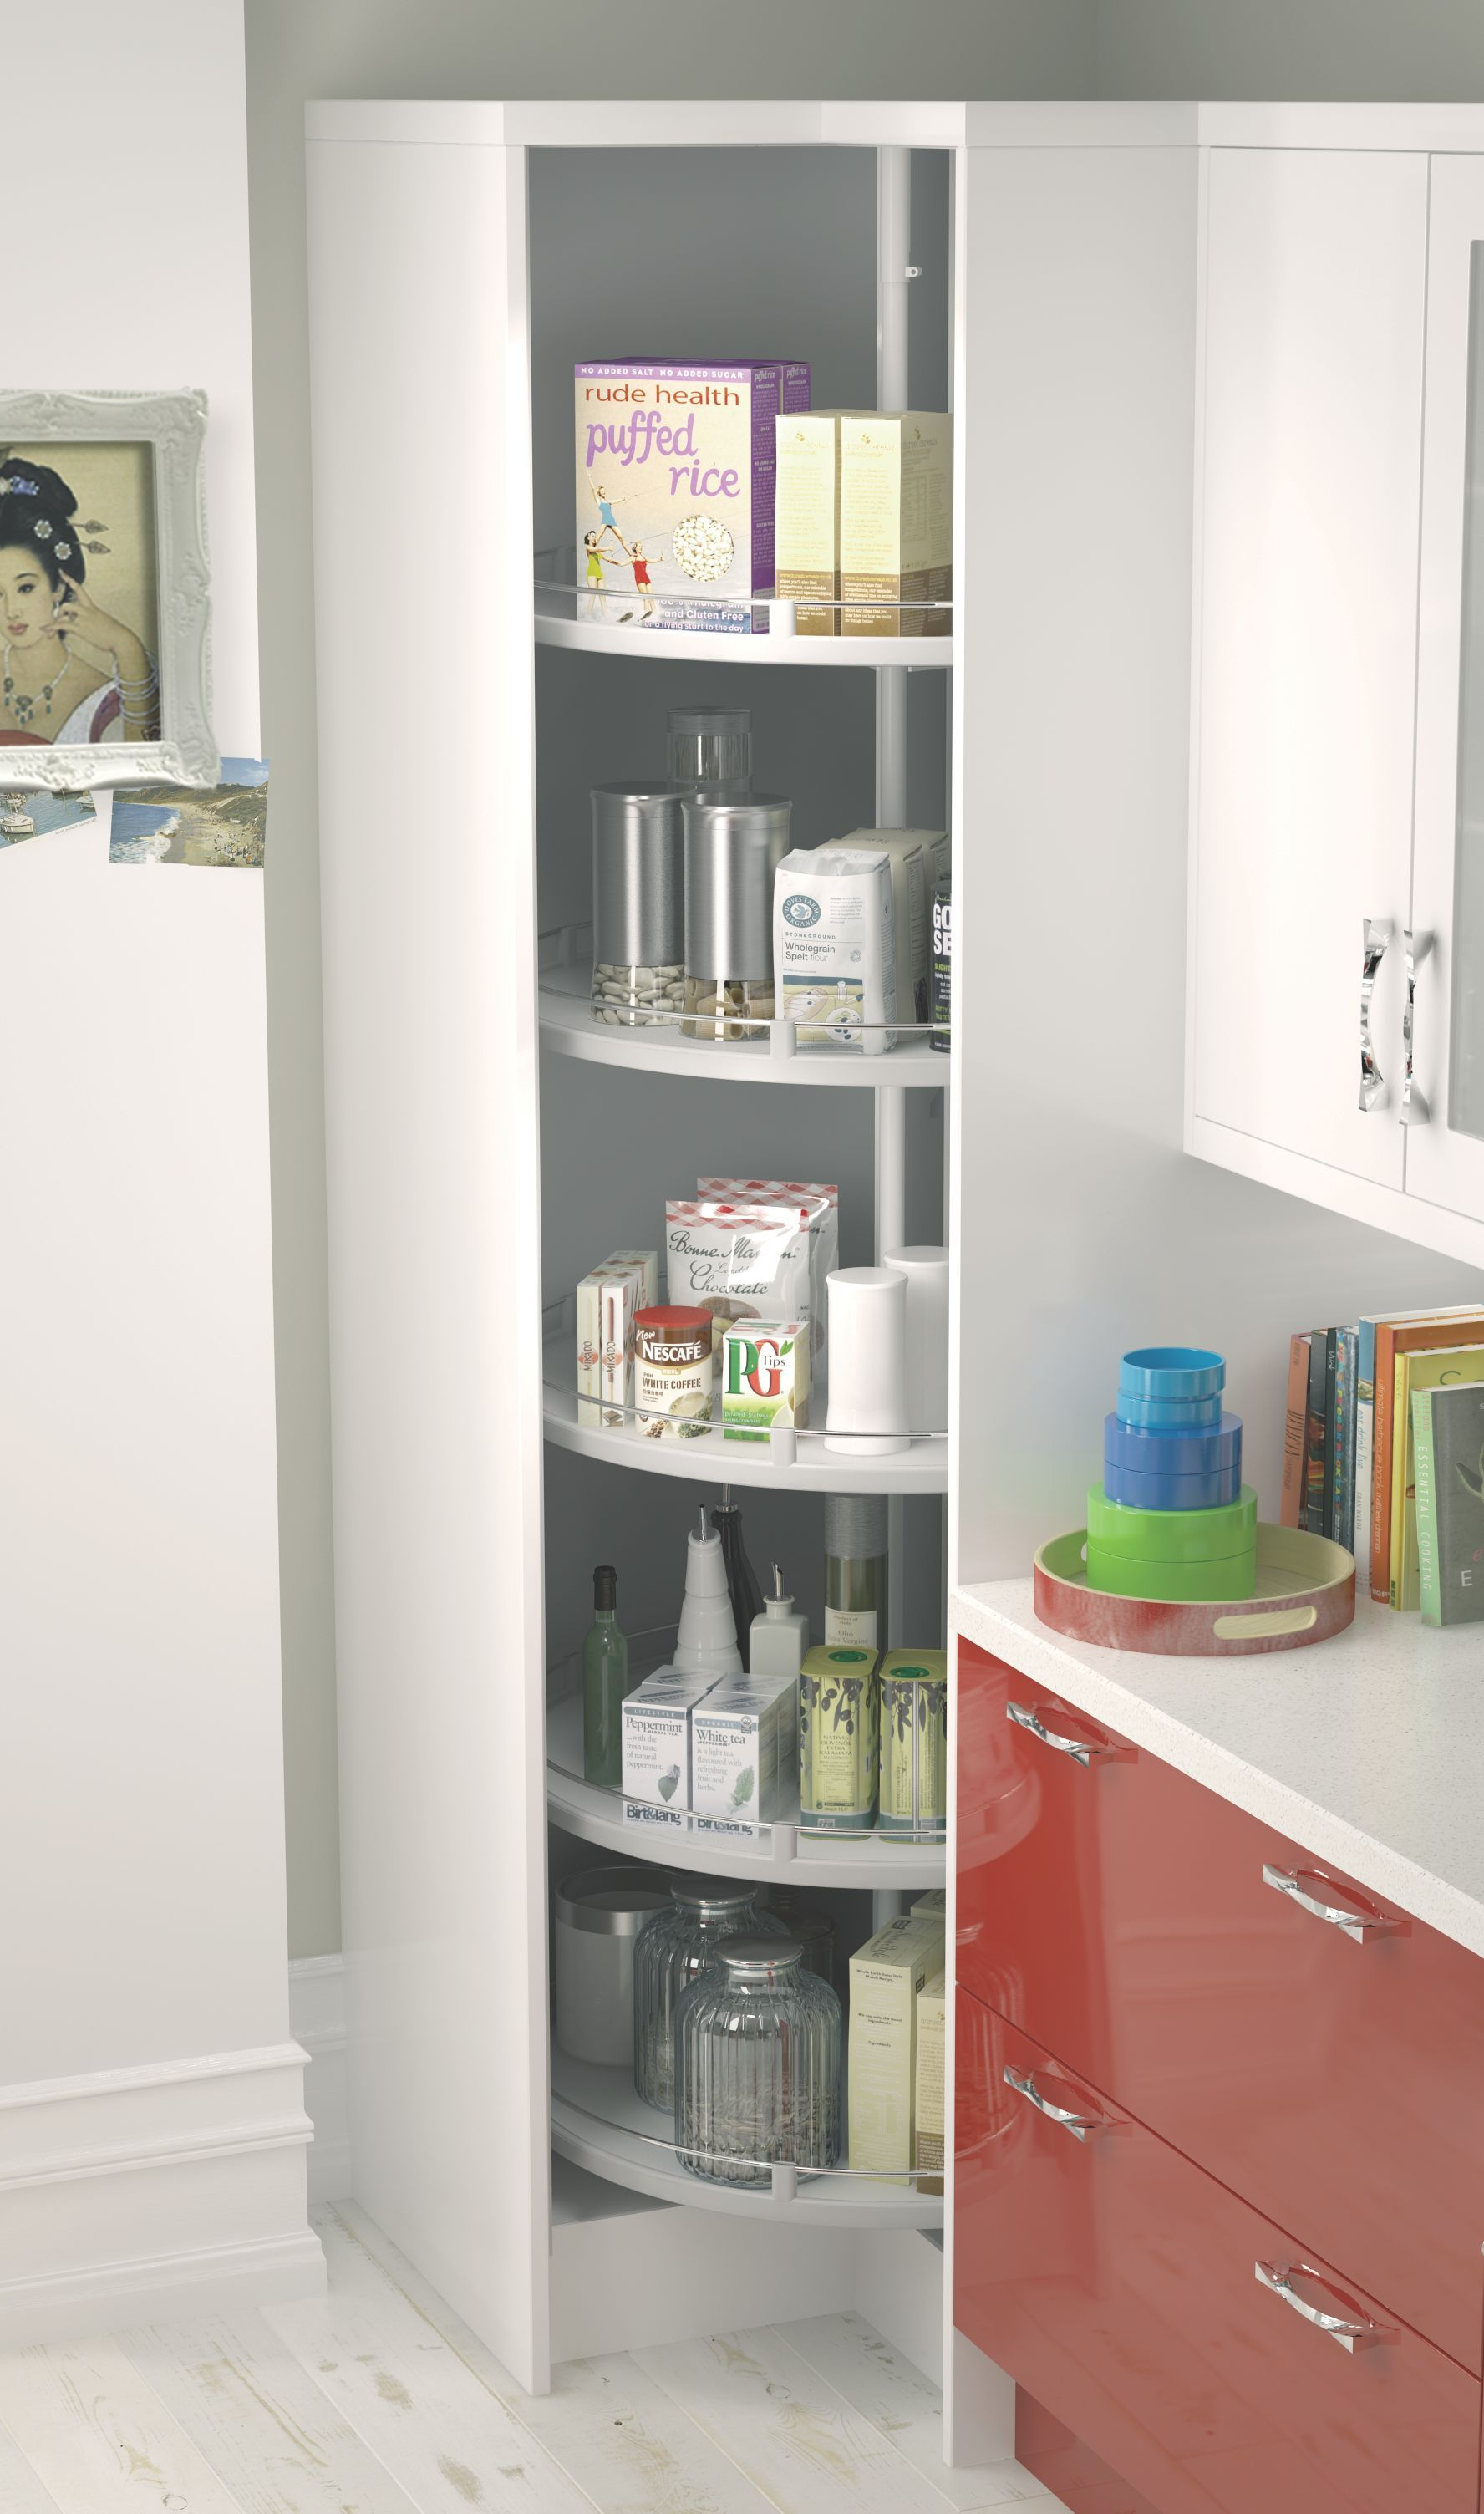 B&Qwhite Storage System Departments DIY at B&Q